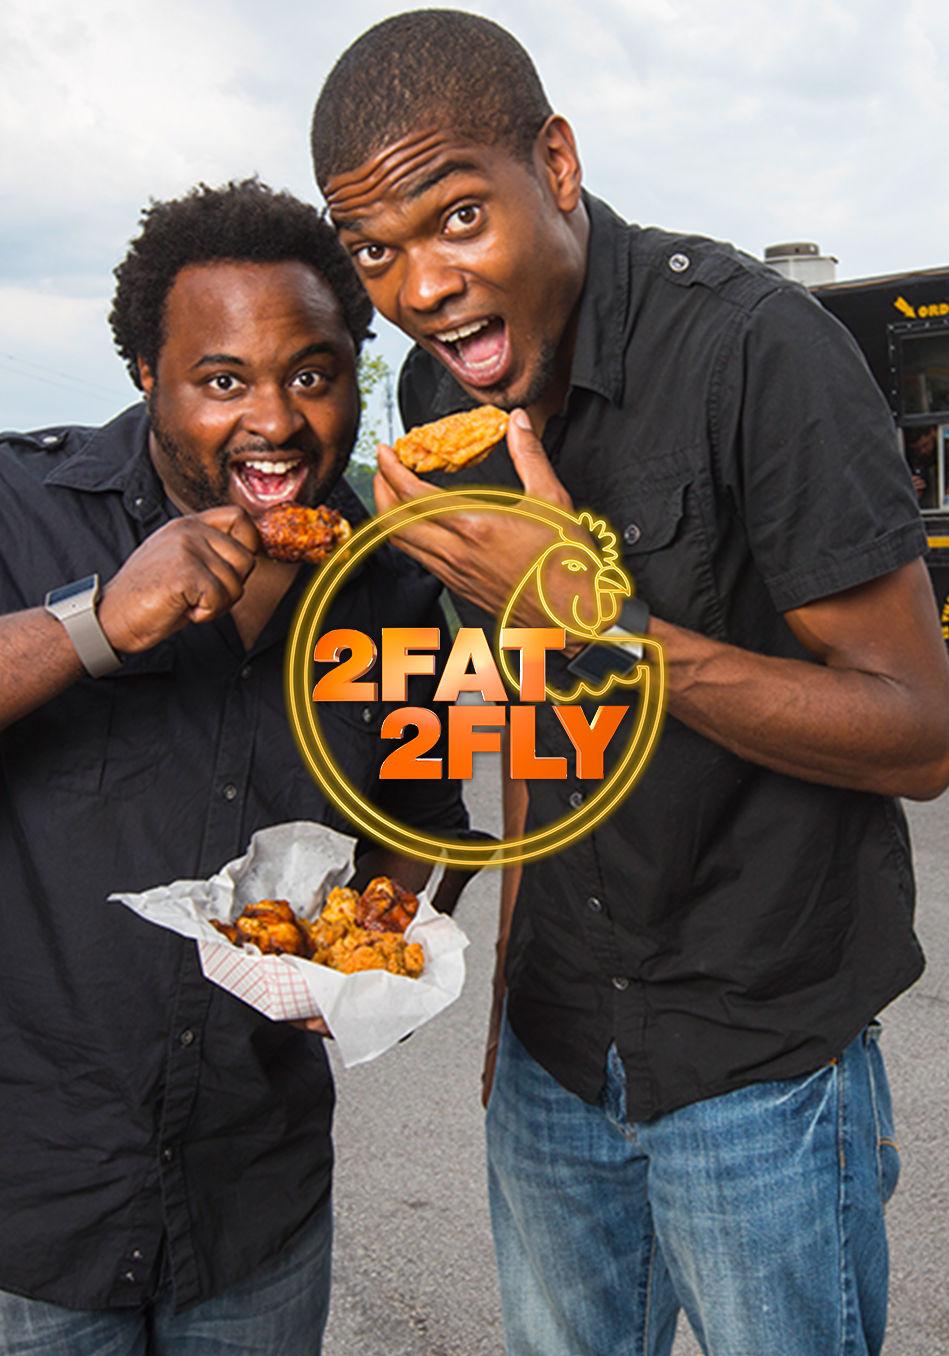 2 Fat 2 Fly ne zaman